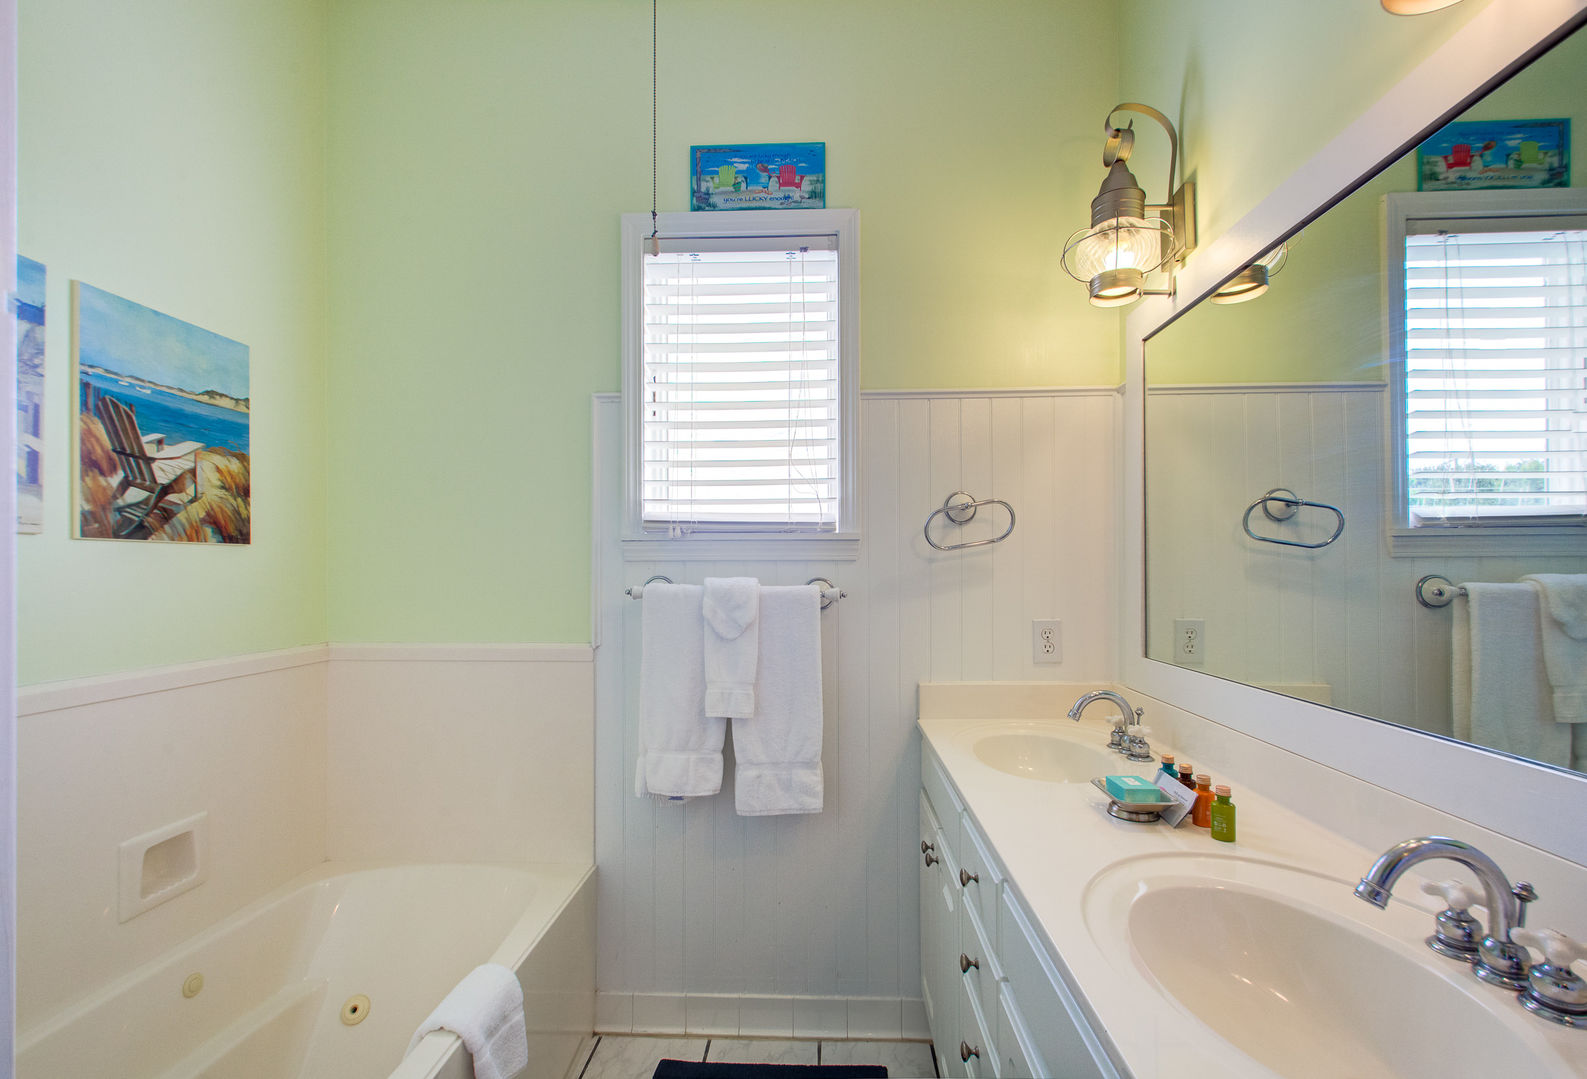 Double Vanity Sink, Bathtub, and Mirror.